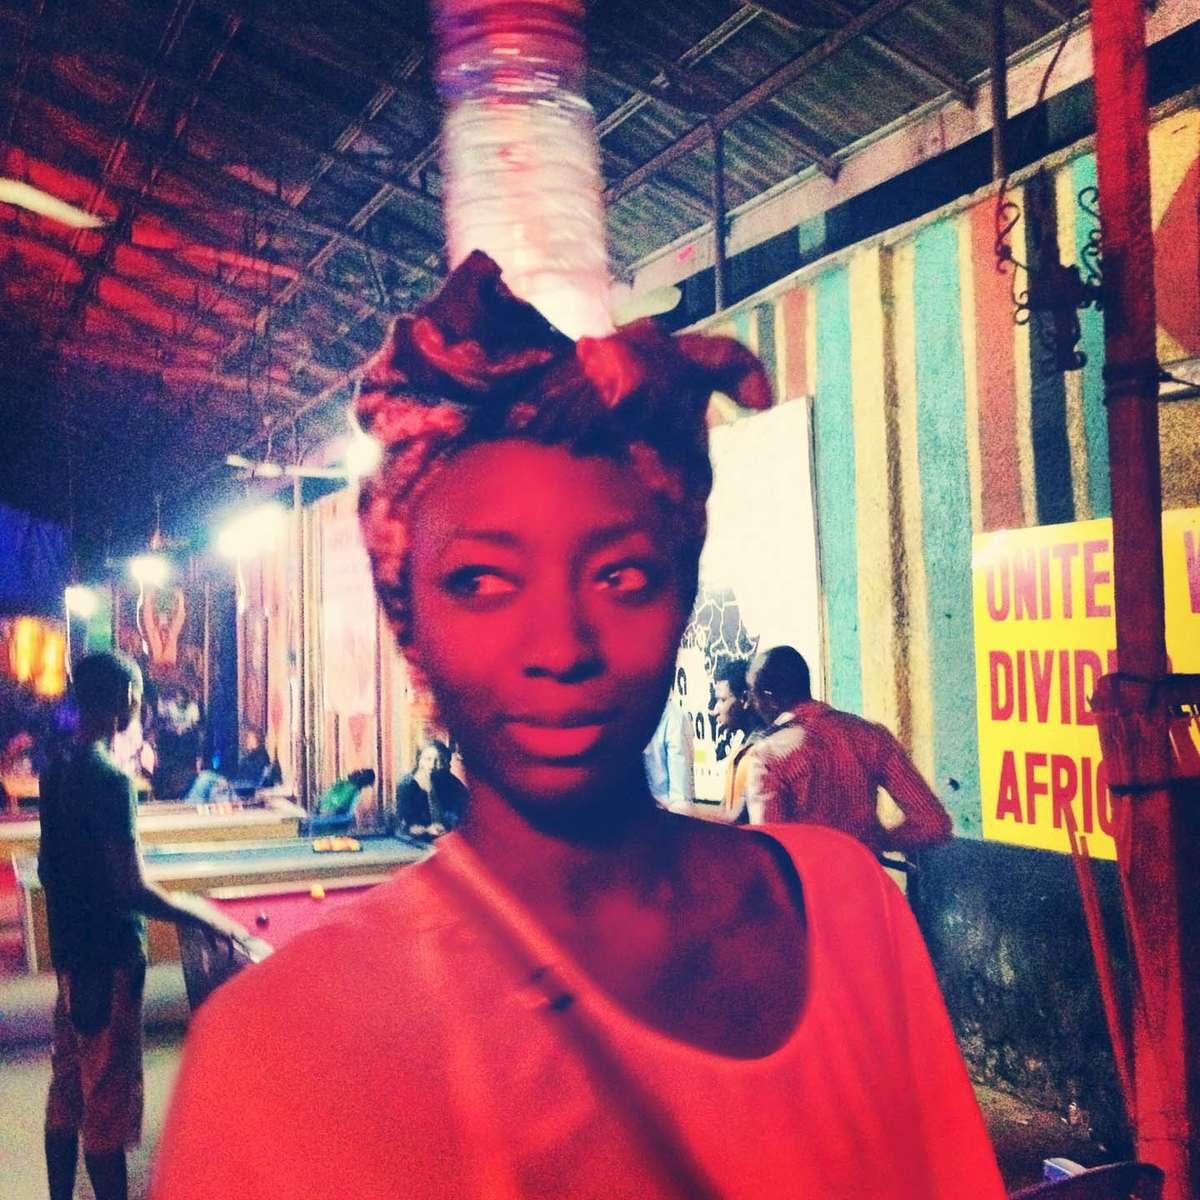 Zainab balances a water bottle at the Shrine, a nightclub in Ikeja, on the mainland of Lagos, Nigeria. September 2012.